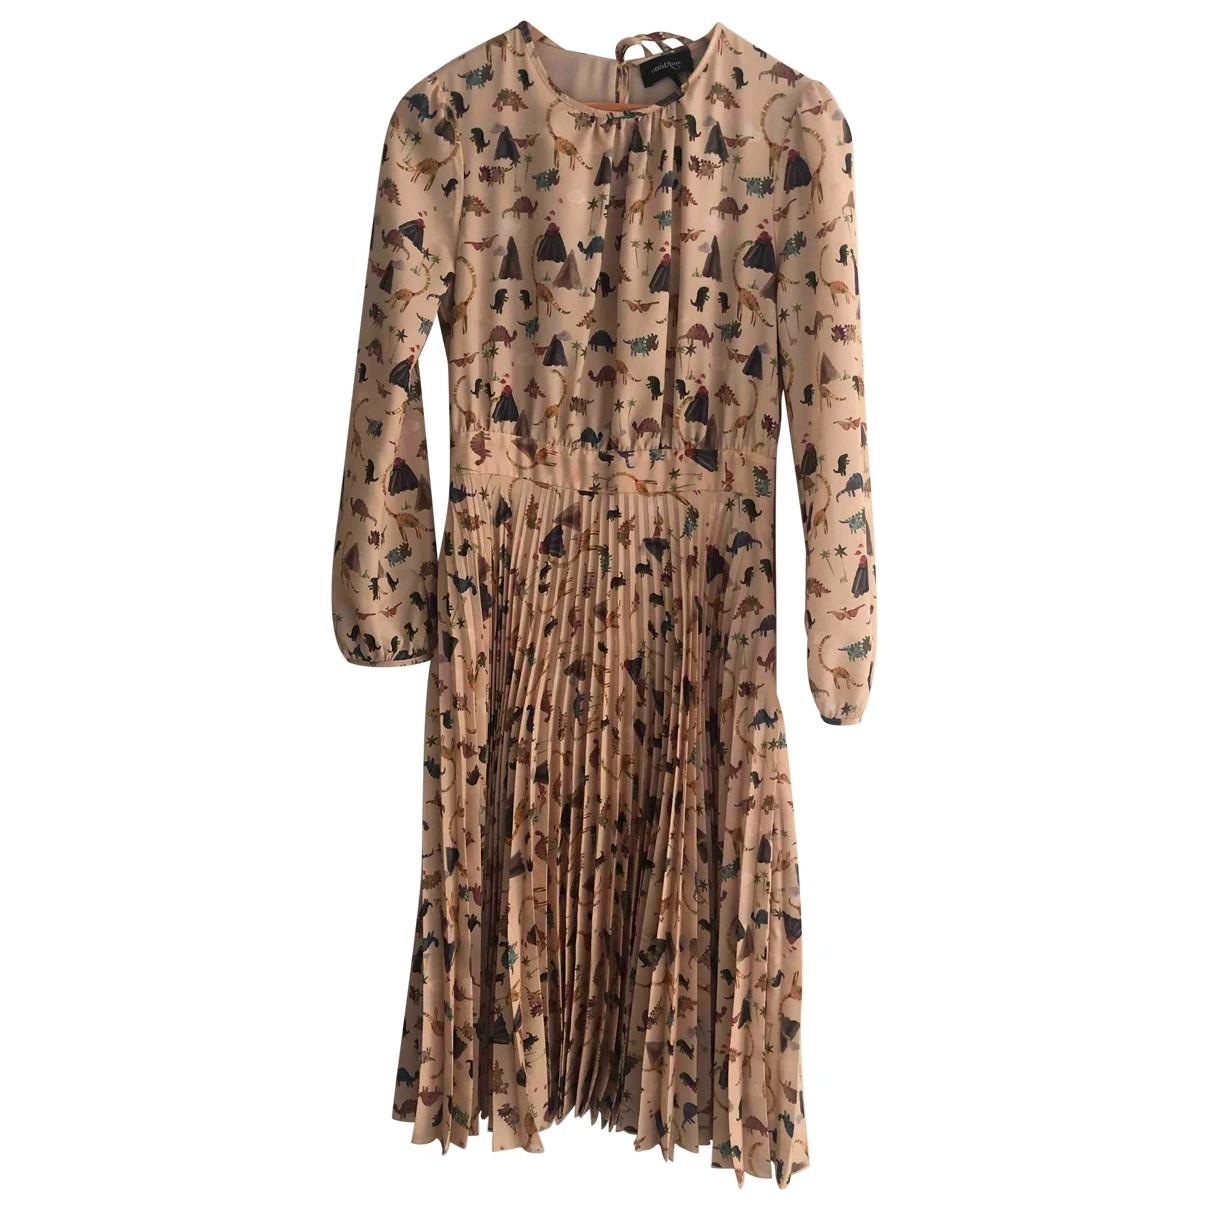 Ottodame \N Kleid in  Beige Polyester